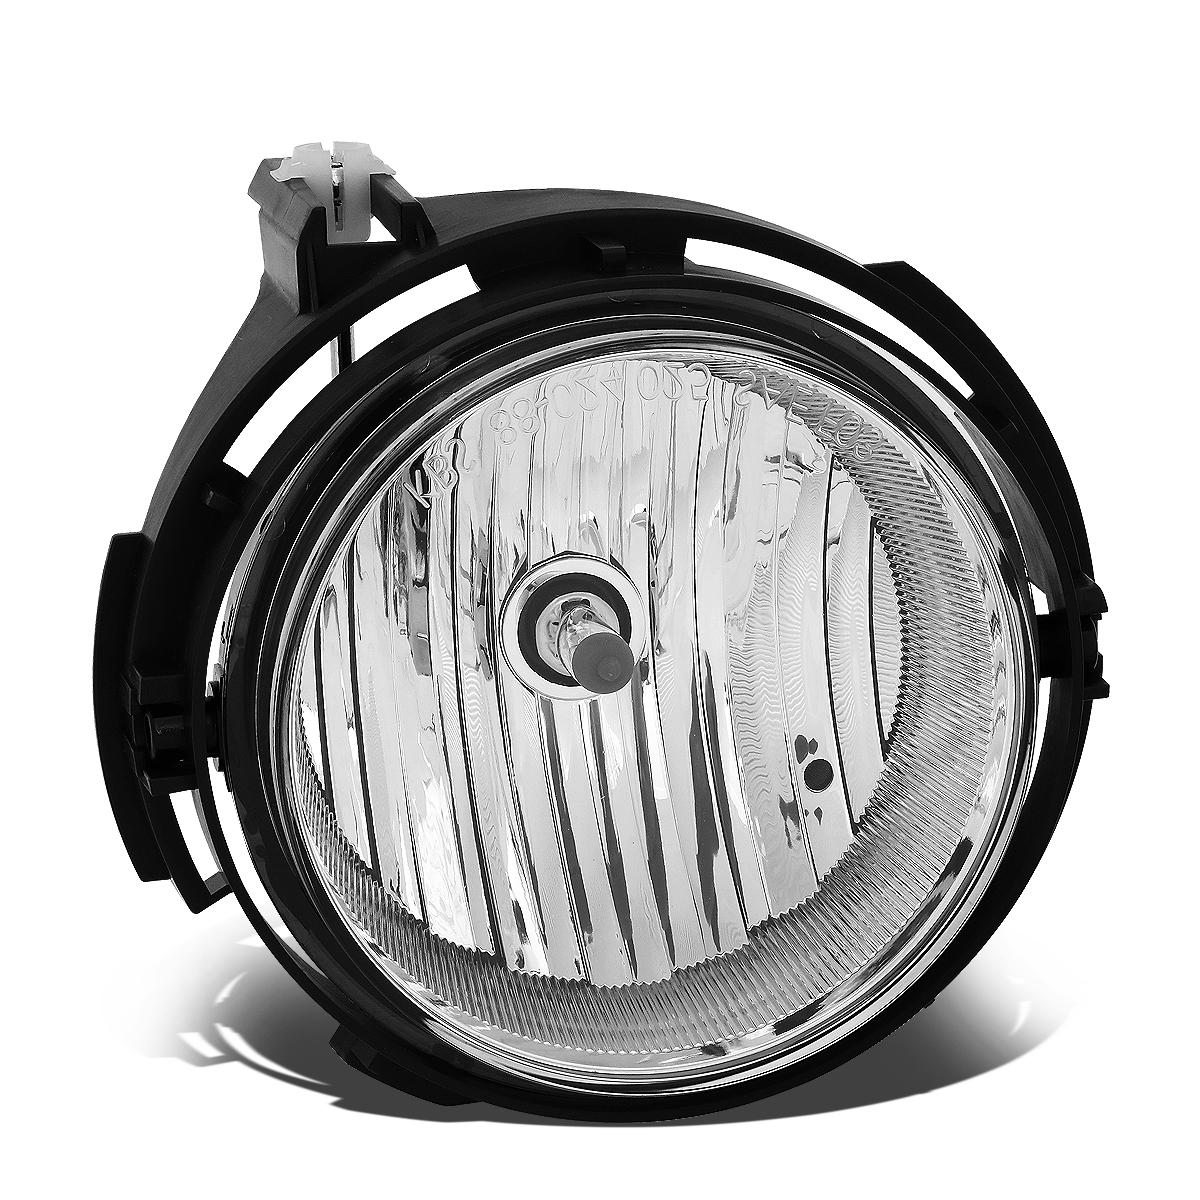 For 06-11 Chevy HHR OE Style Passenger/Right Side Front Bumper Fog Light/Lamp 07 08 09 10